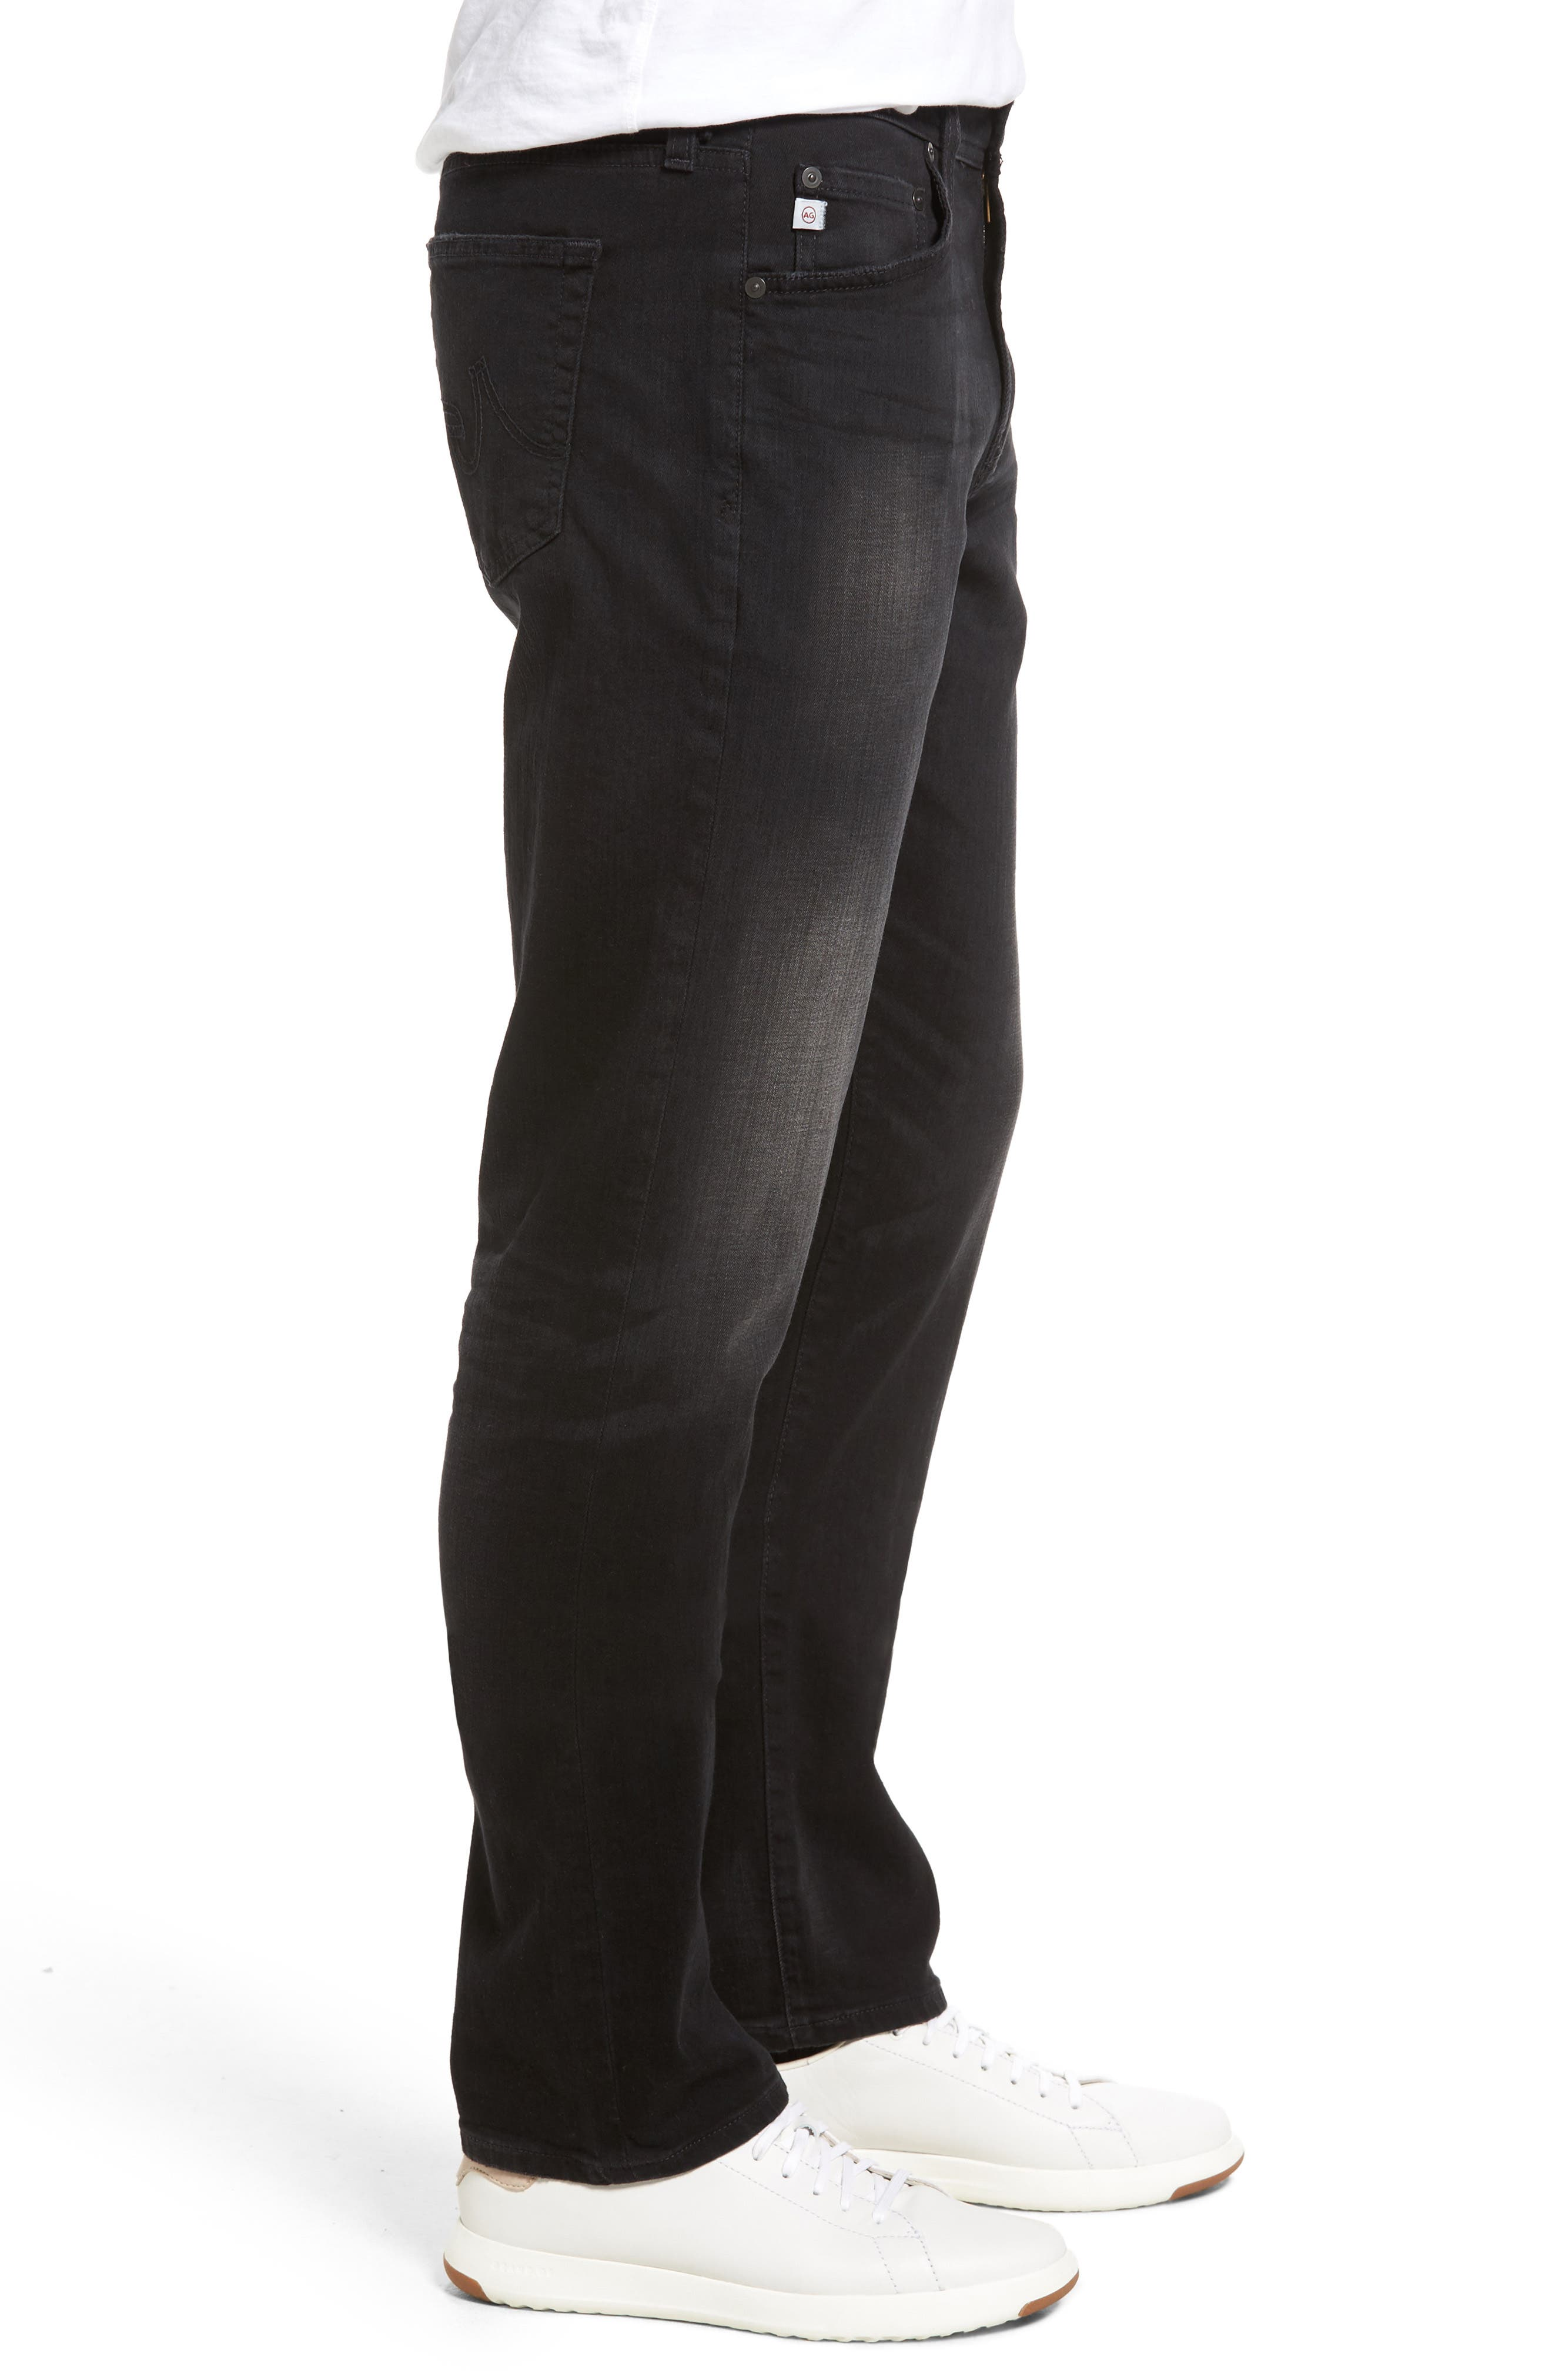 Graduate Slim Straight Leg Jeans,                             Alternate thumbnail 3, color,                             415